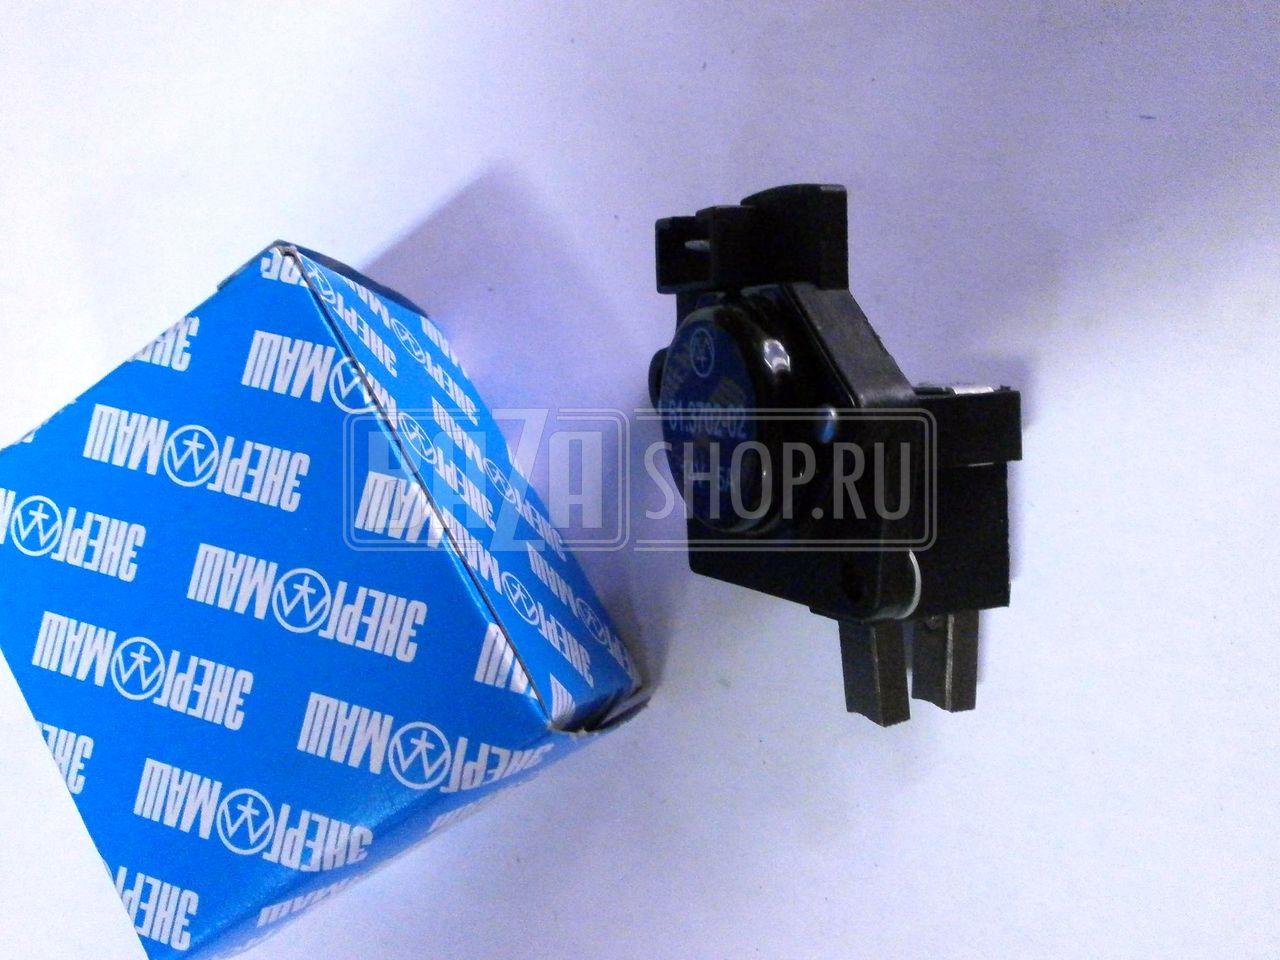 Пластины теплообменника КС 52 Калуга сертификат теплообменники